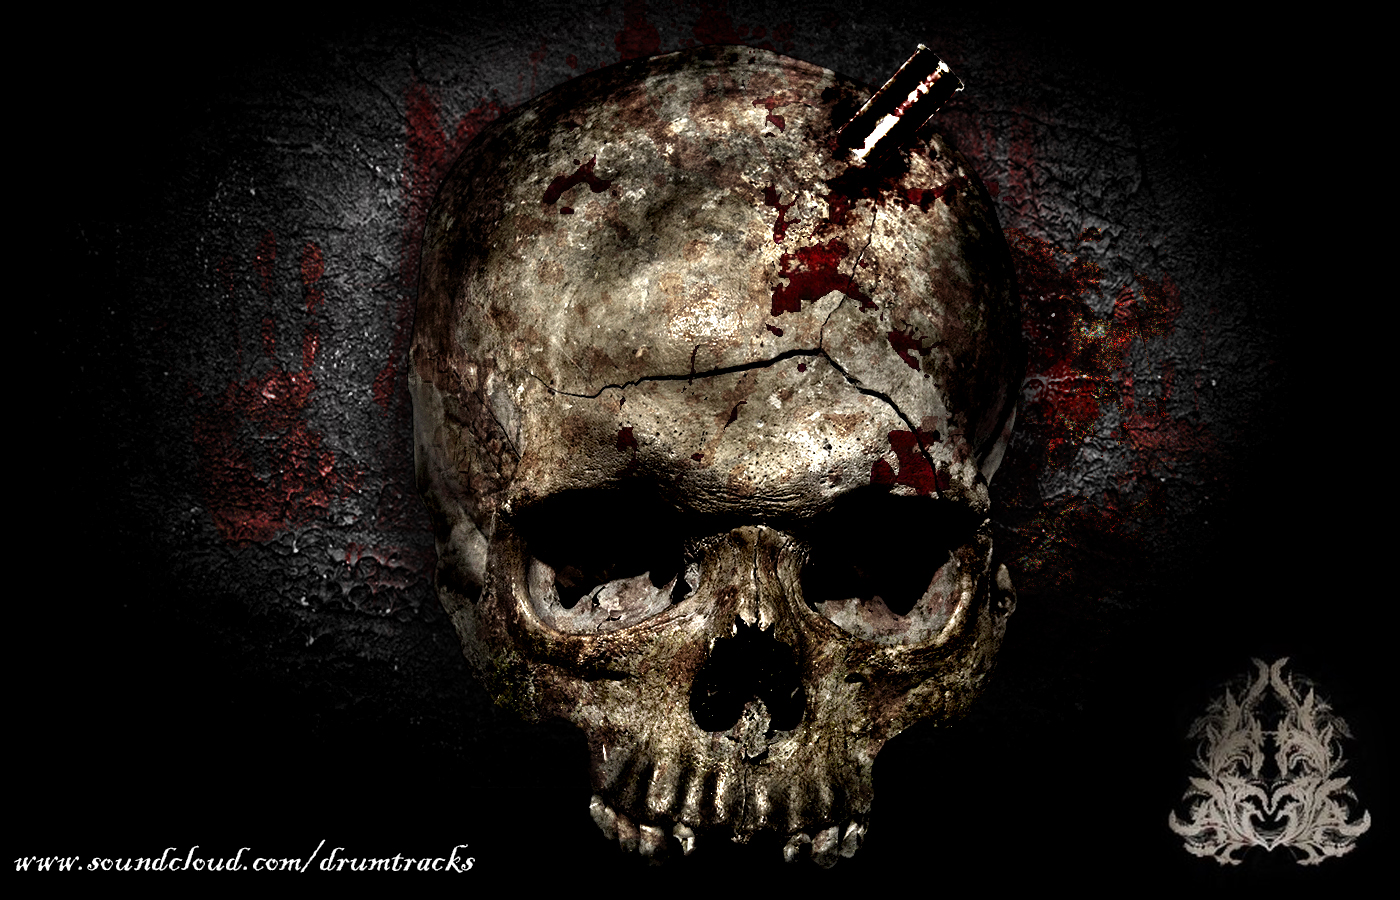 Skull Art Wallpaper | www.imgkid.com - The Image Kid Has It!